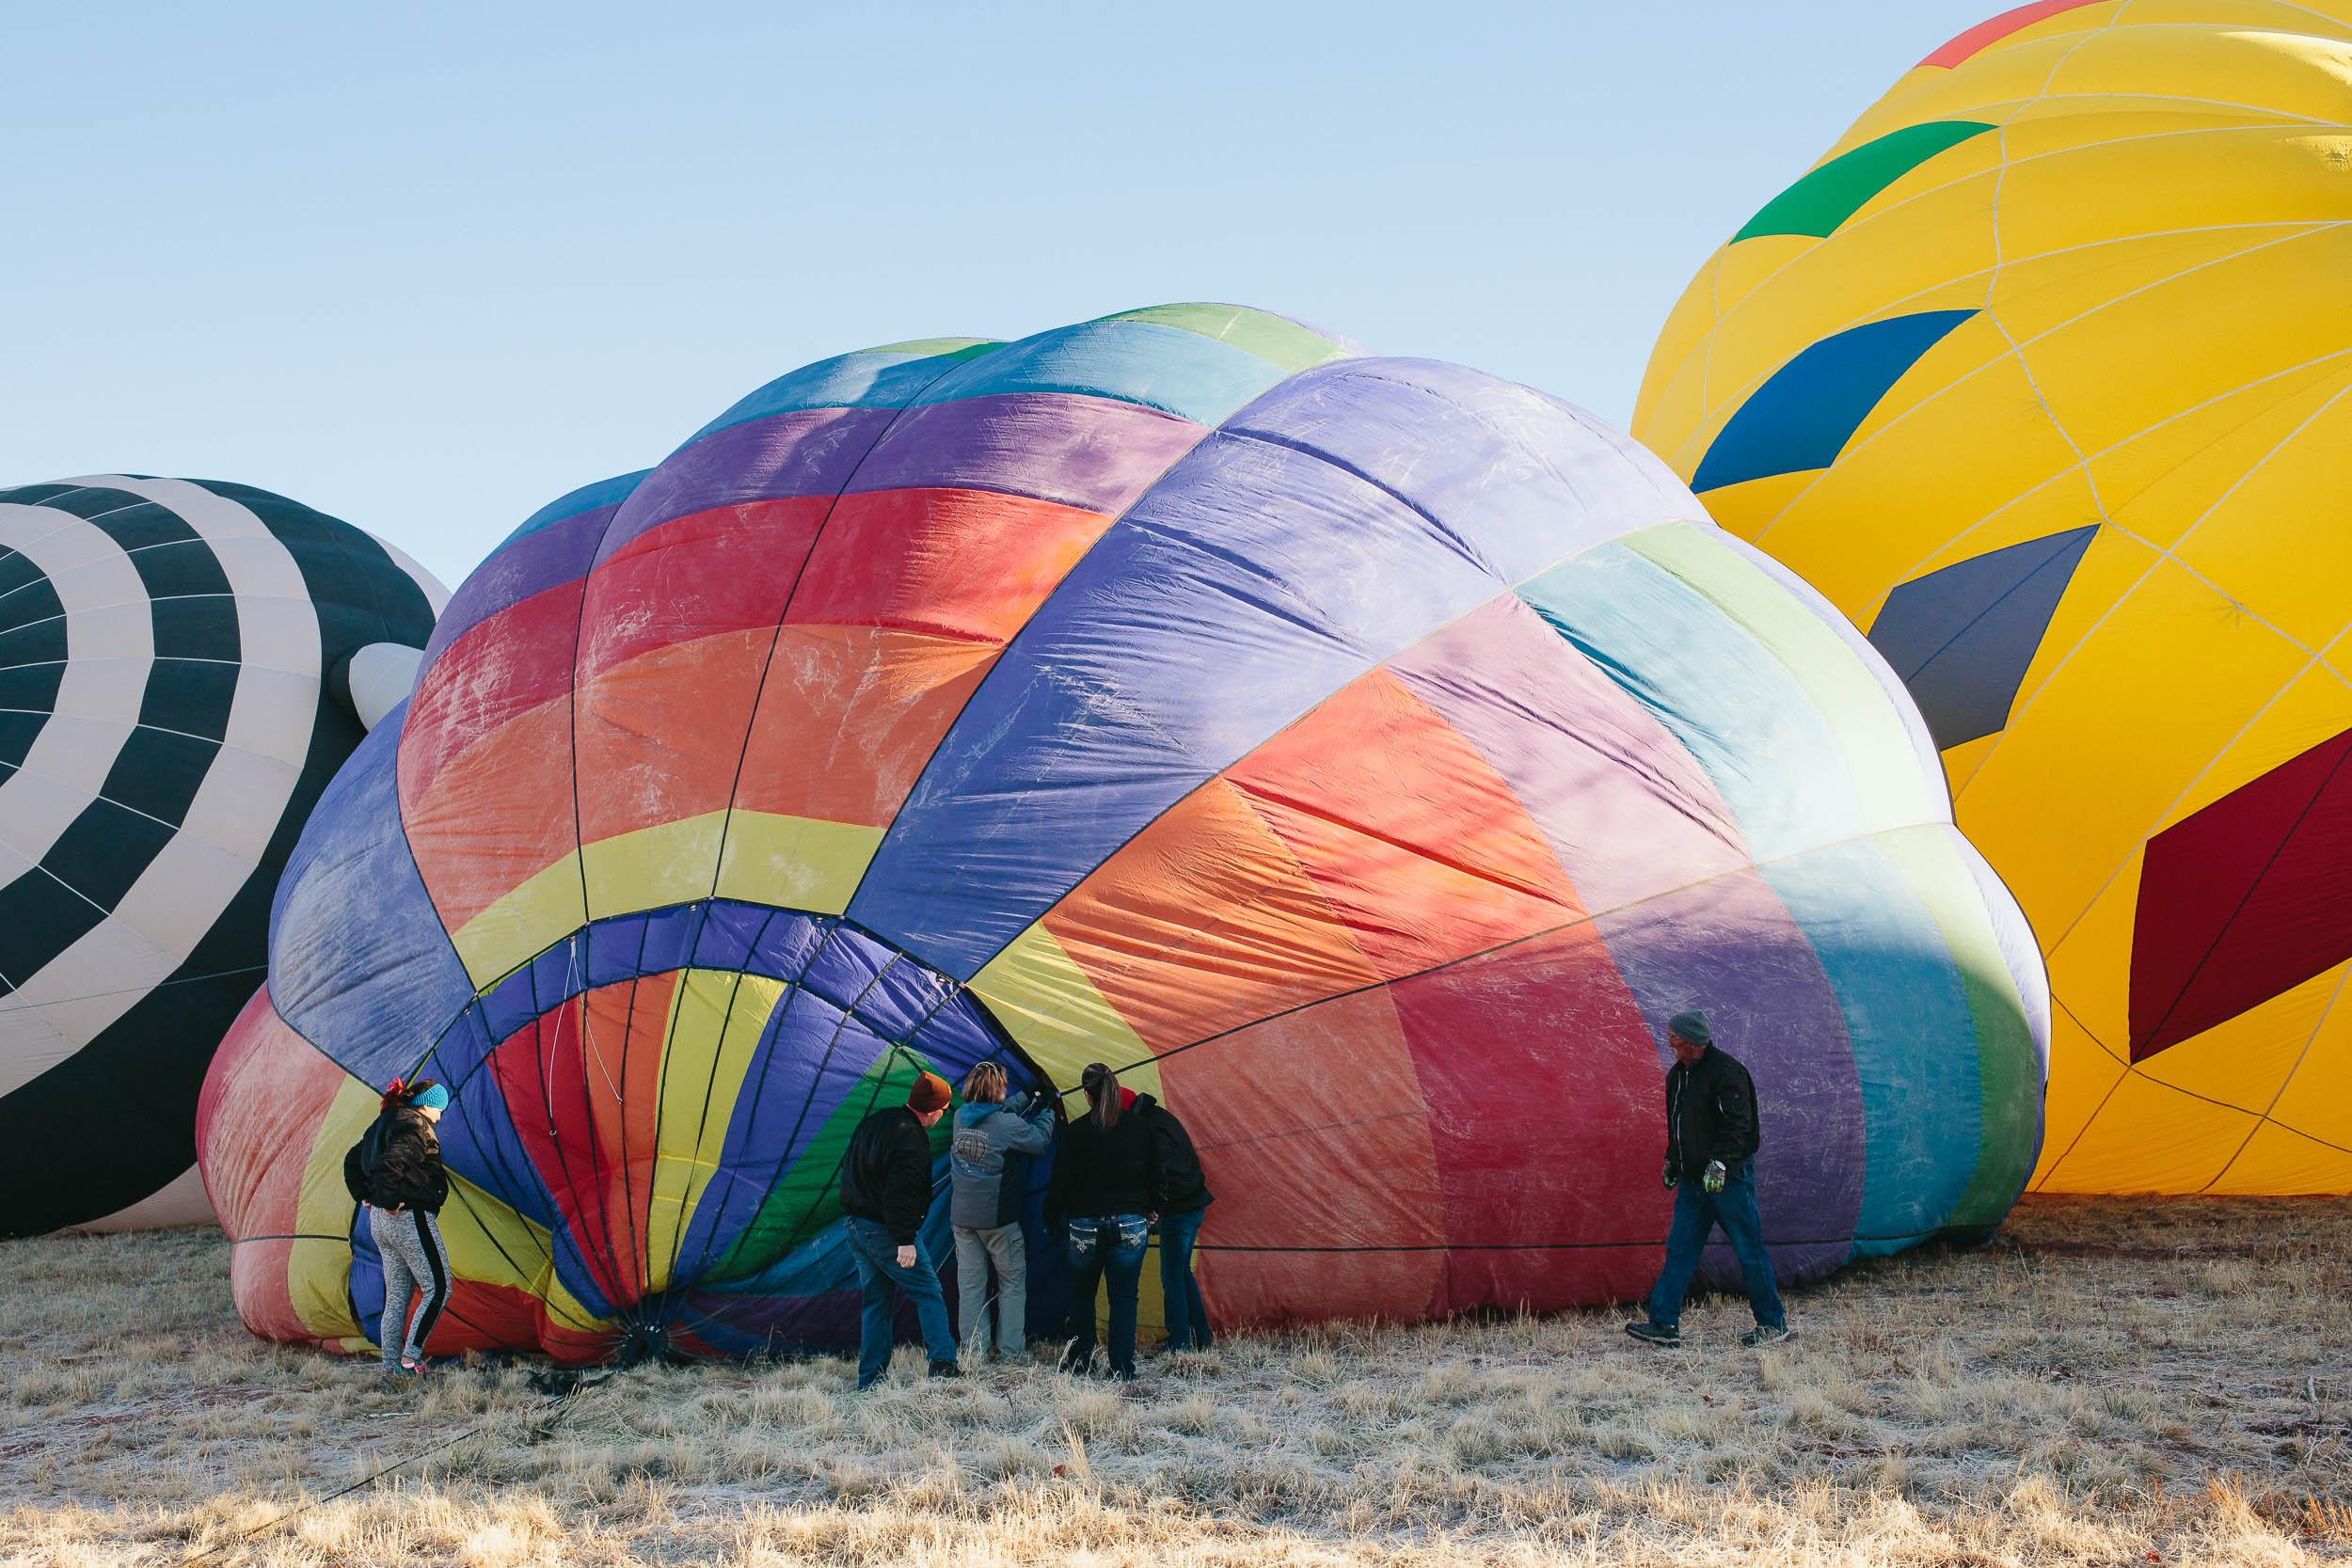 Kyle-Sheppard-Kanab-Balloon-Festival-6.jpg